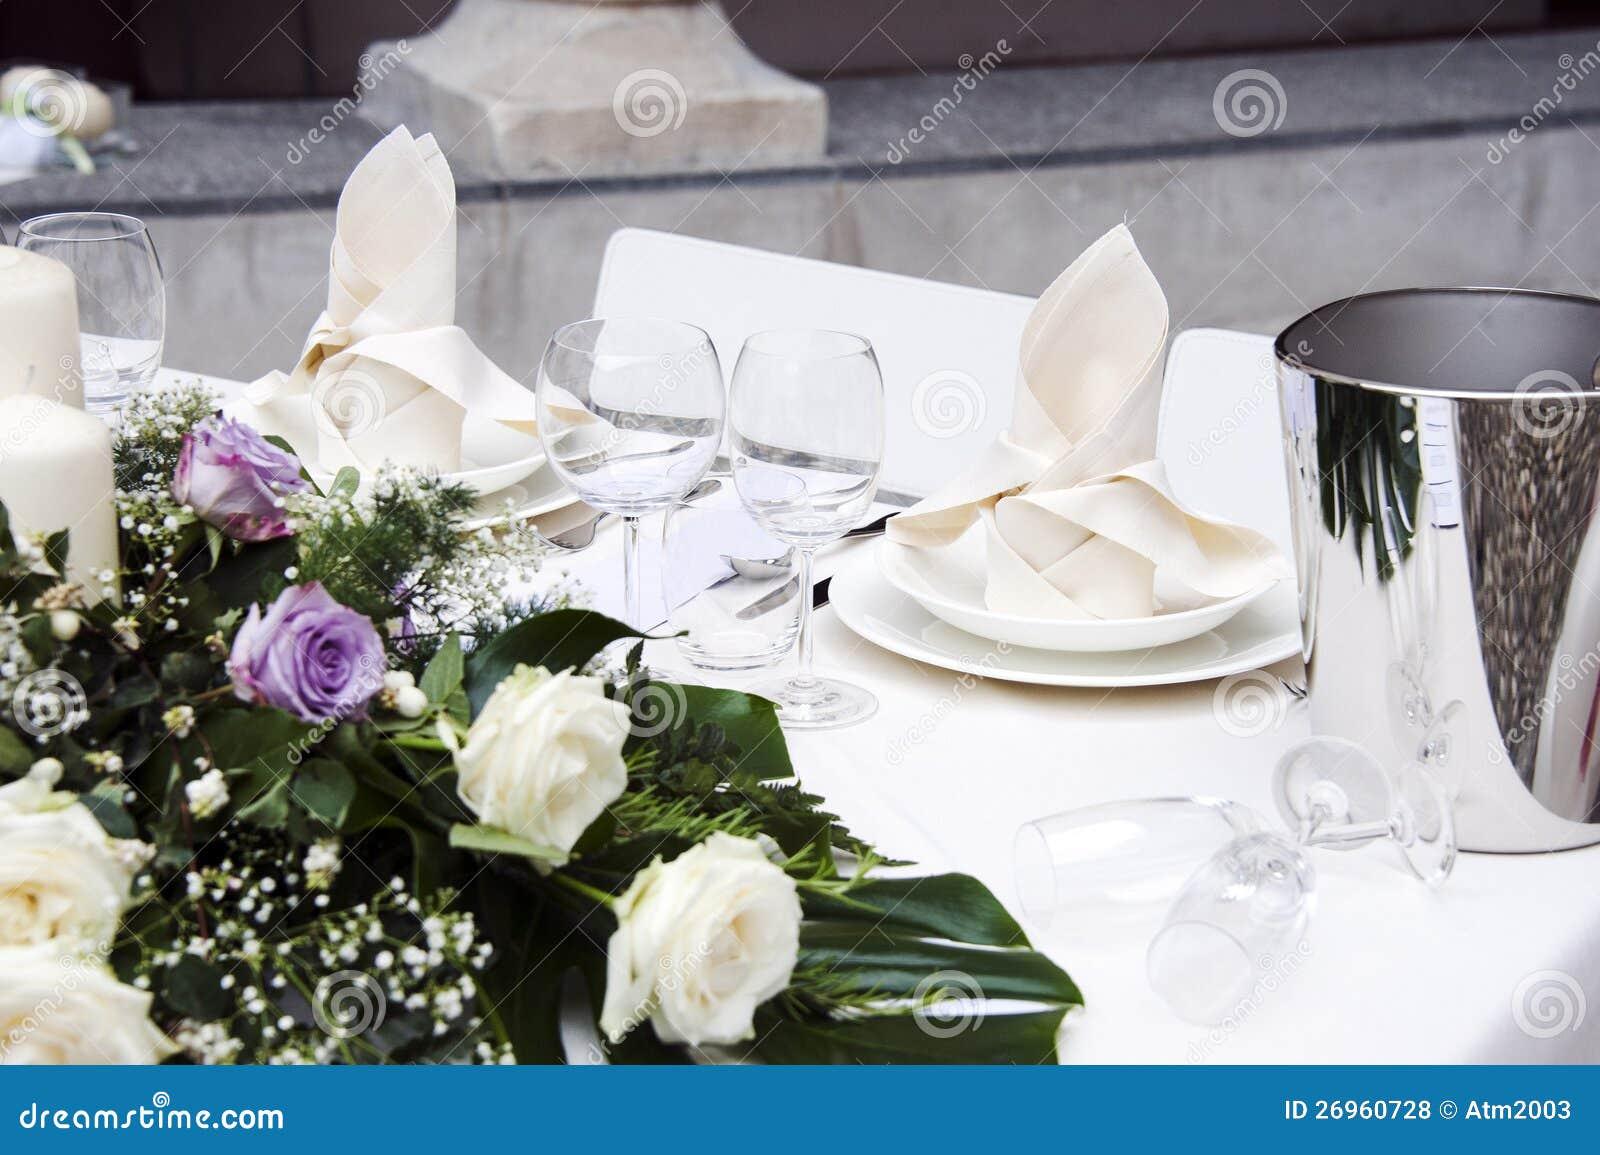 Romantic Table Setting Royalty Free Stock Photos Image